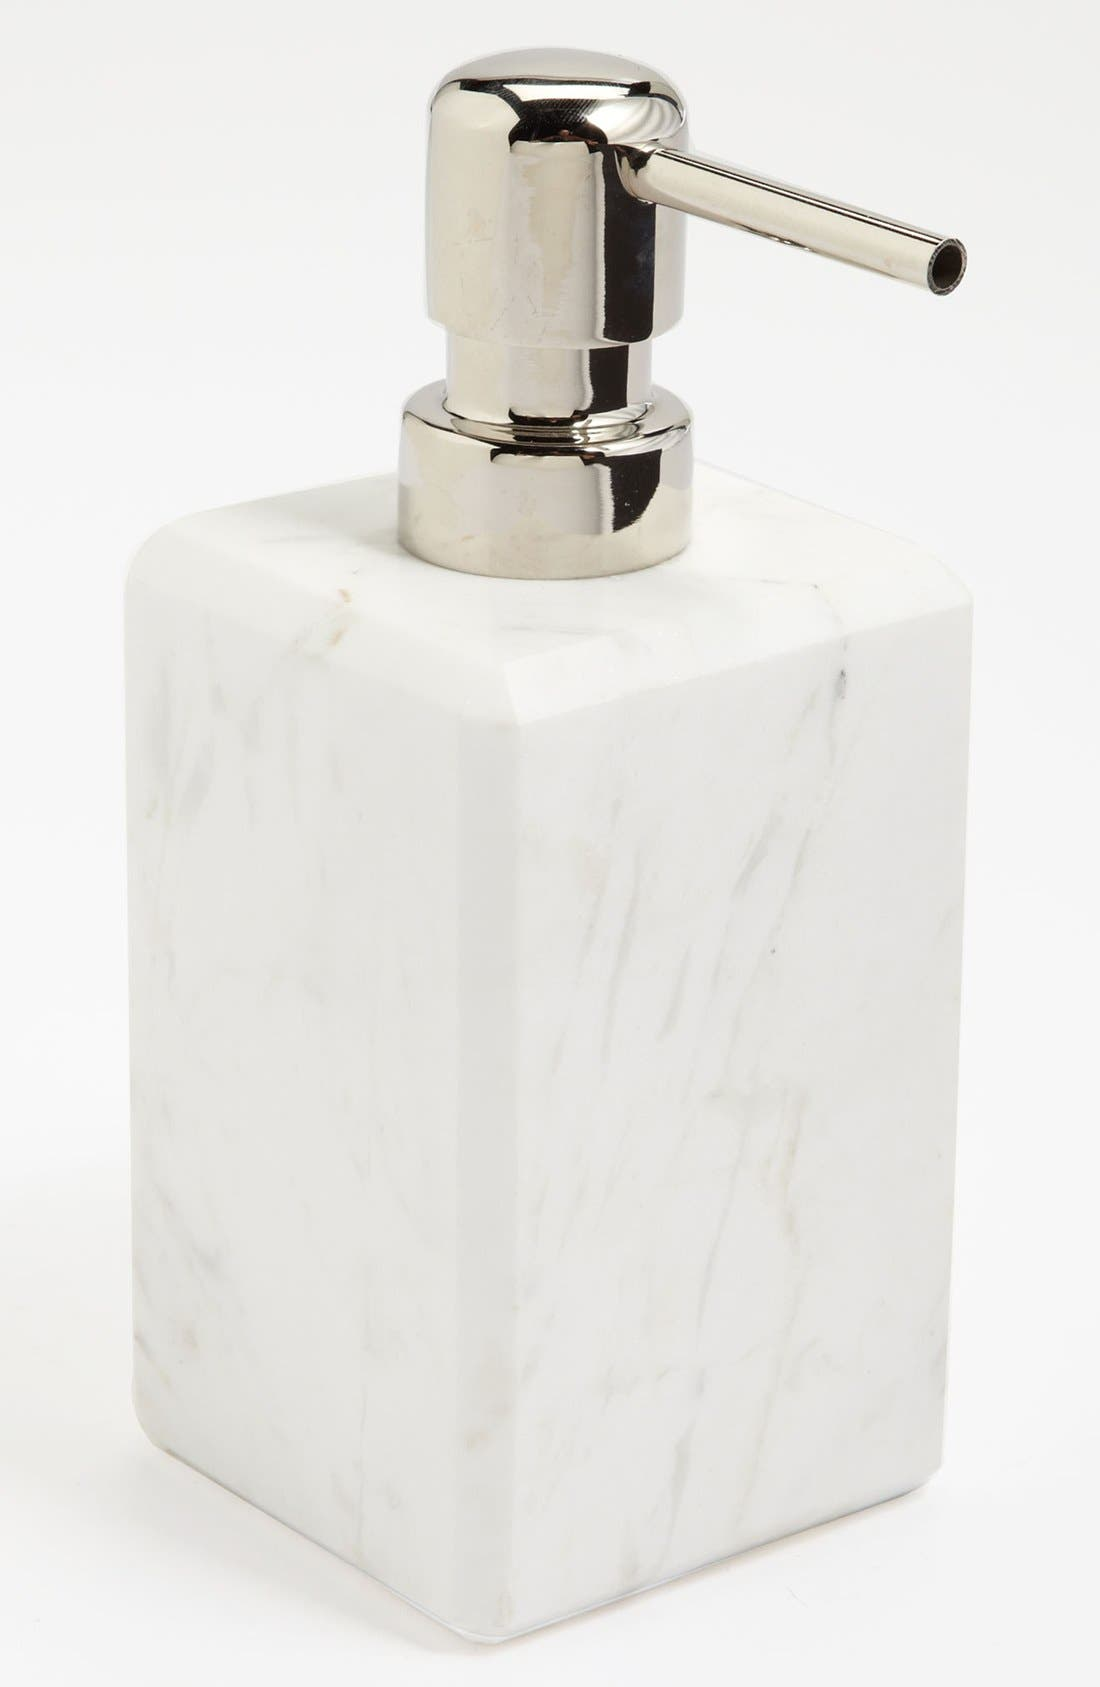 Main Image - Waterworks Studio 'Luna' White Marble Soap Dispenser (Online Only)